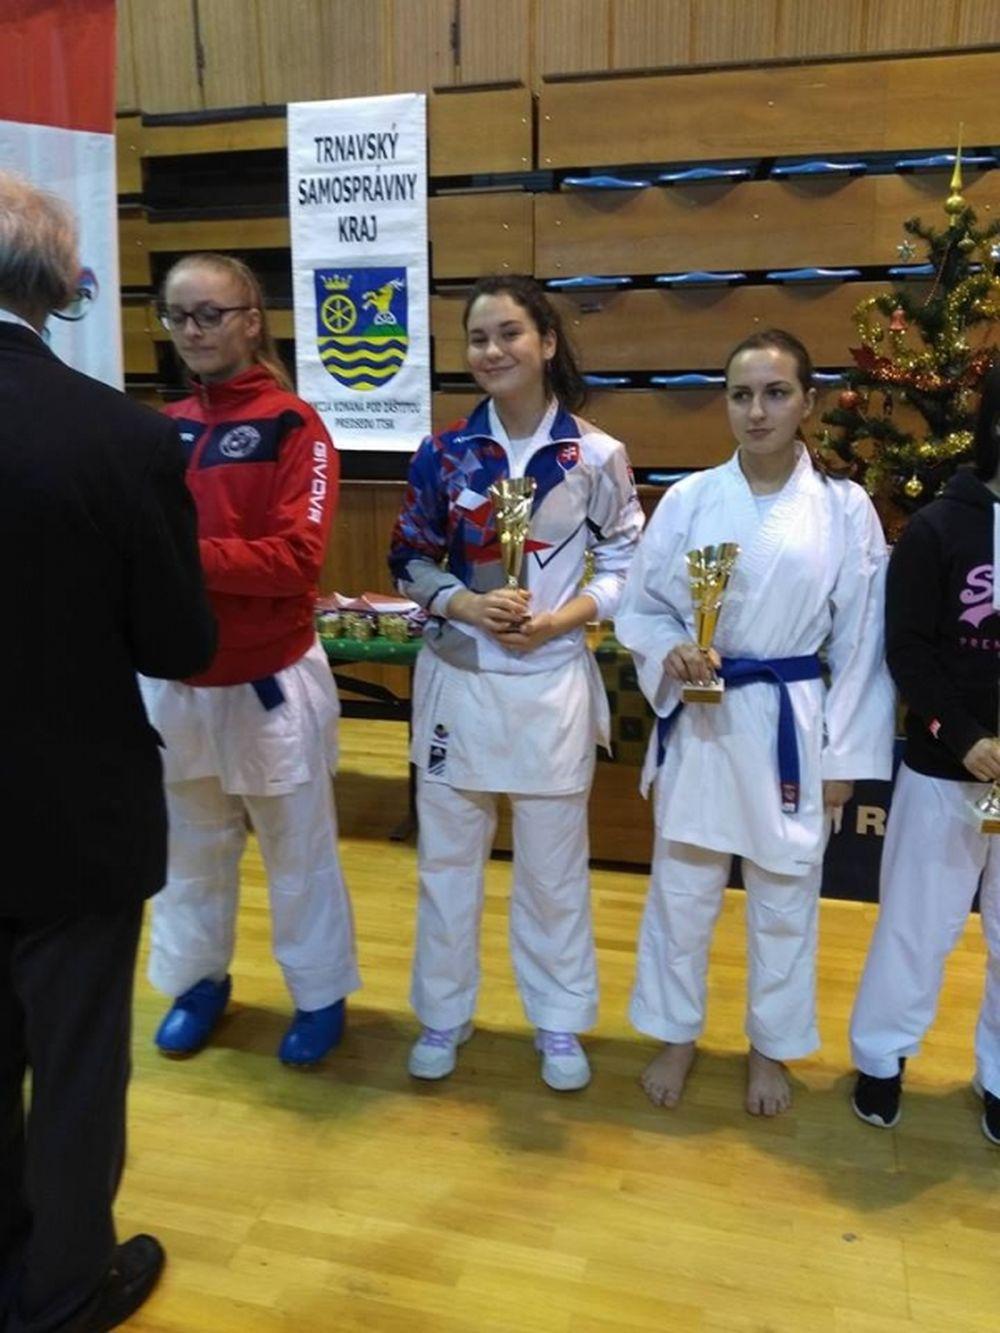 Úspechy Karate klub Žilina Trnava 3.12.2016 - 4.12.2016, foto 2